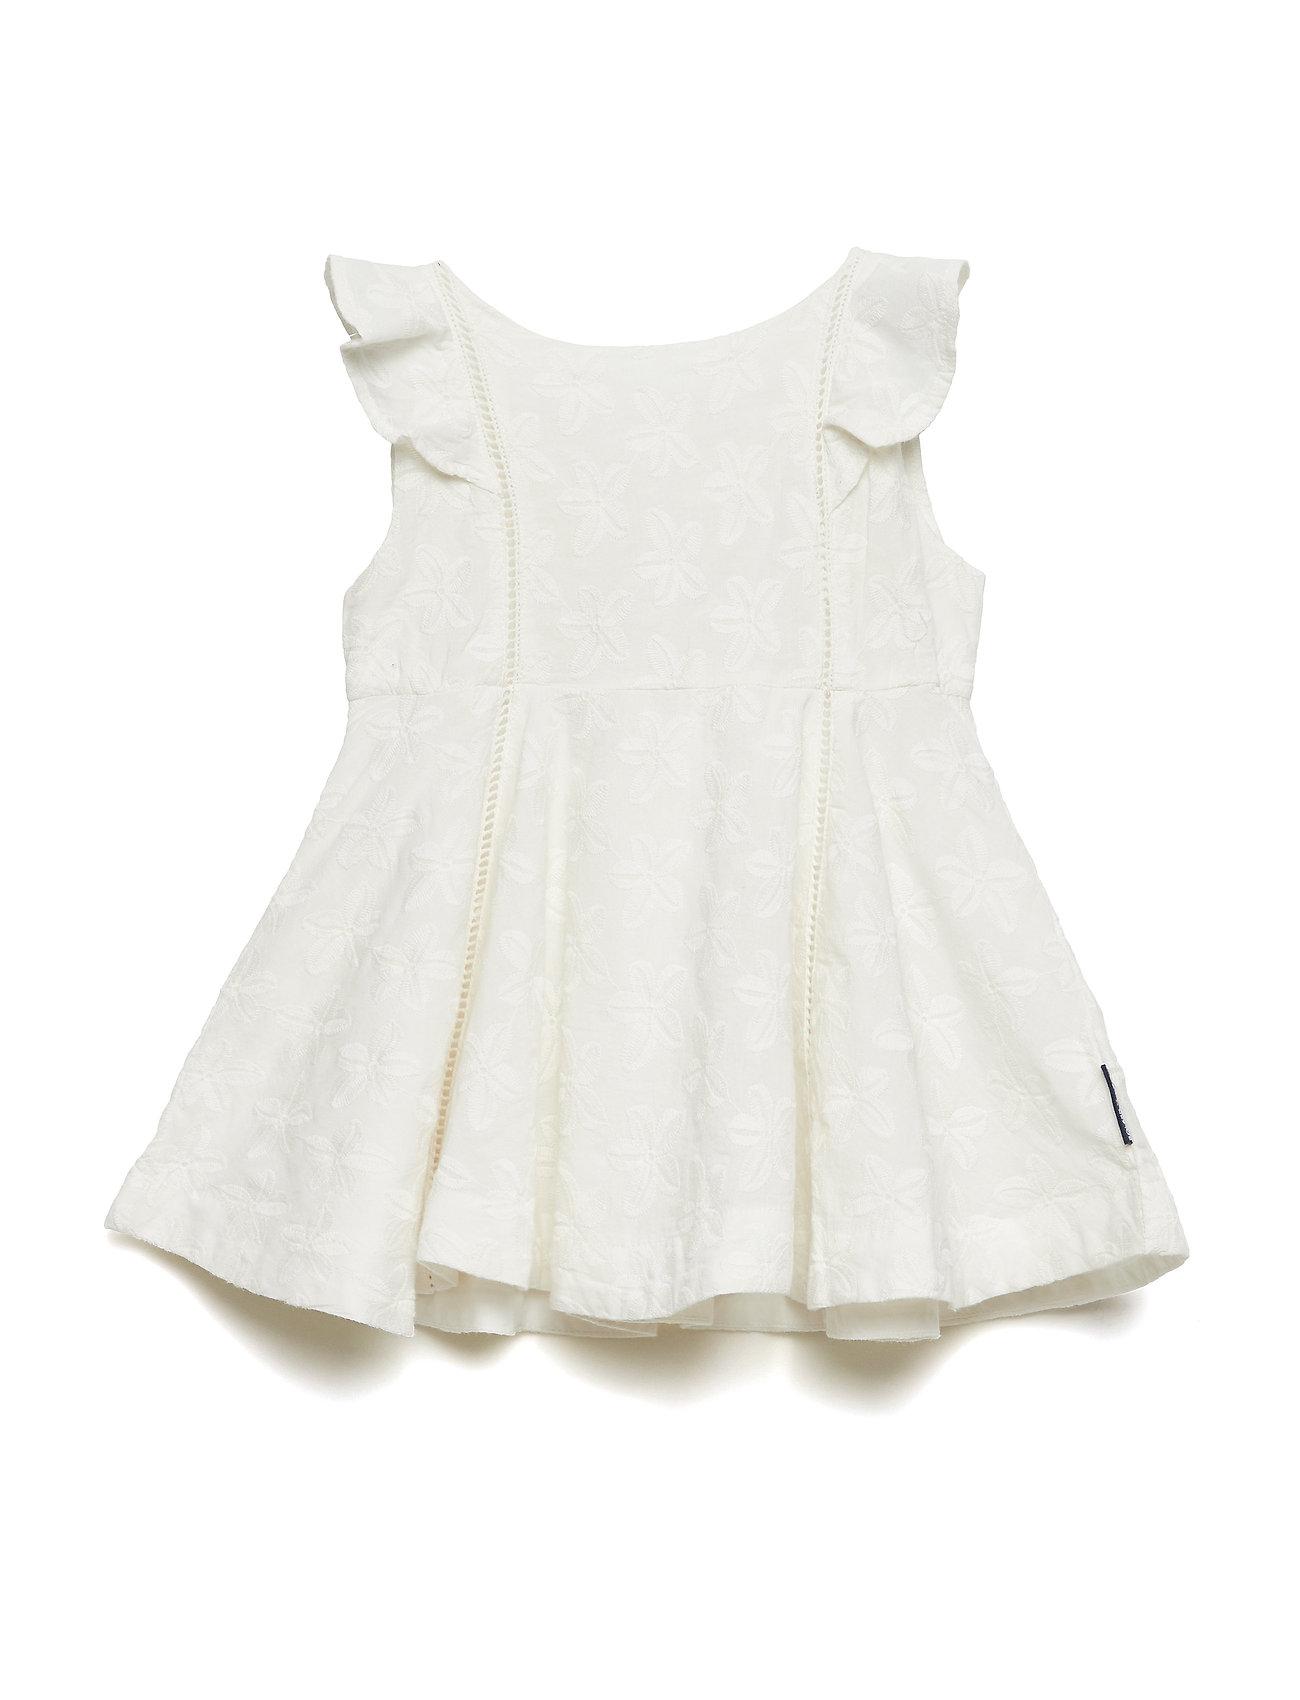 Polarn O. Pyret Dress Embroidery Preschool